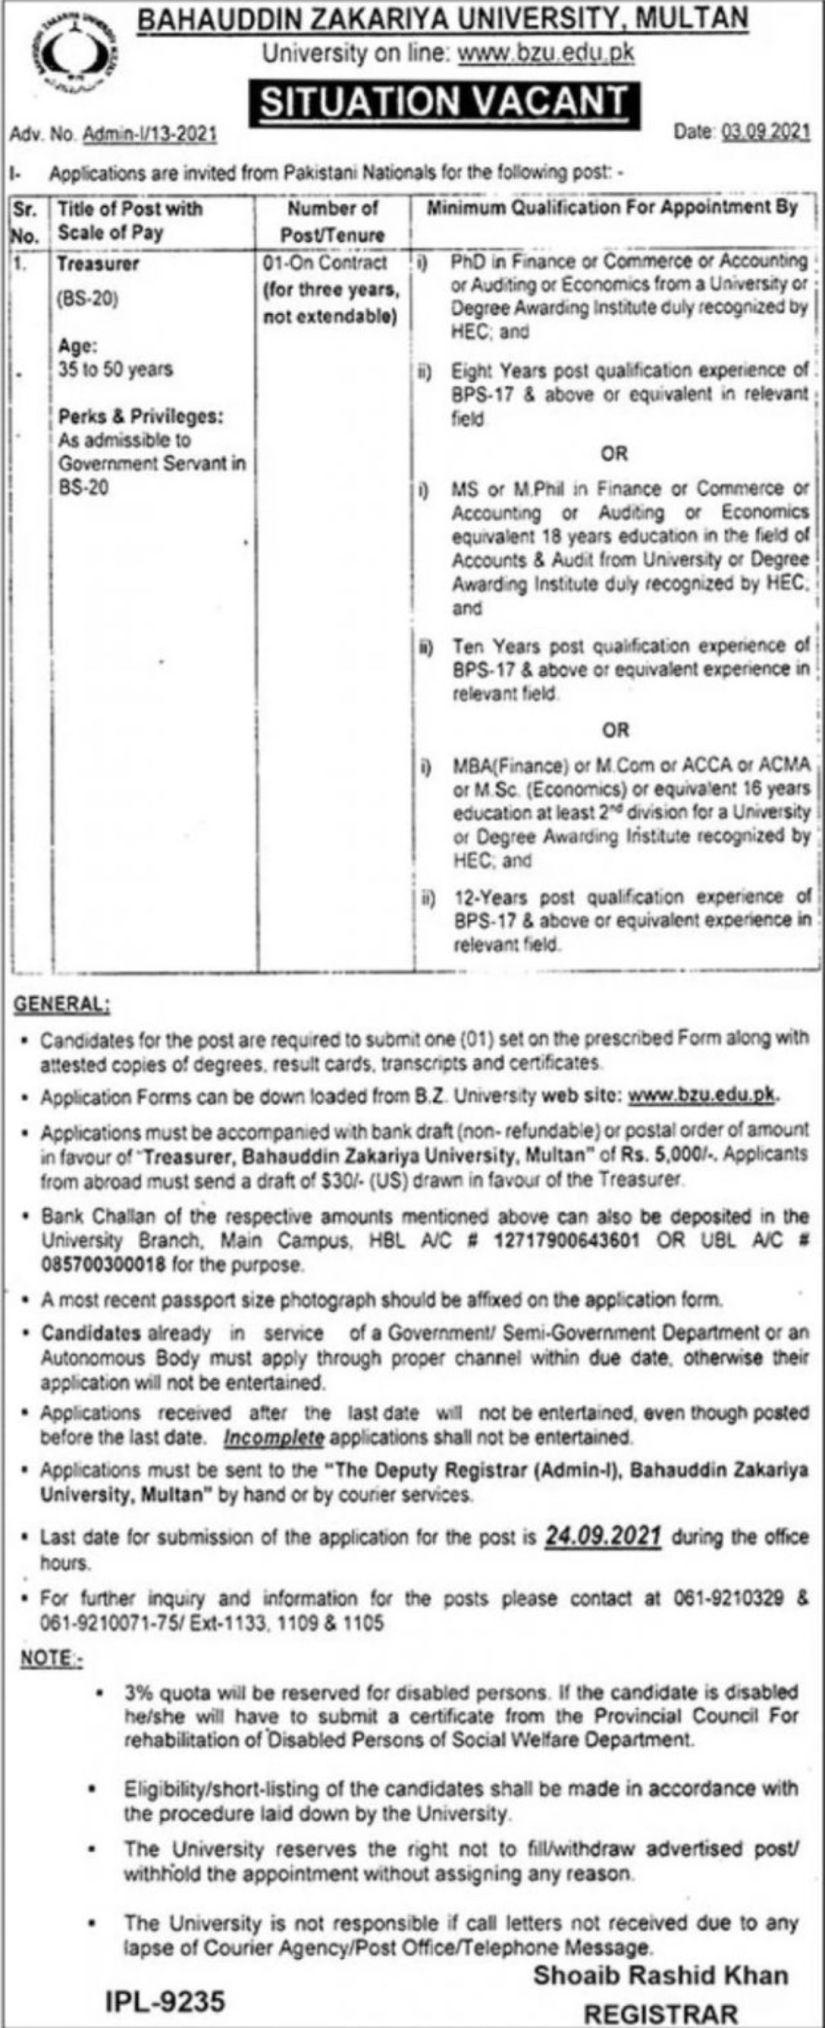 BZU Multan Jobs 2021